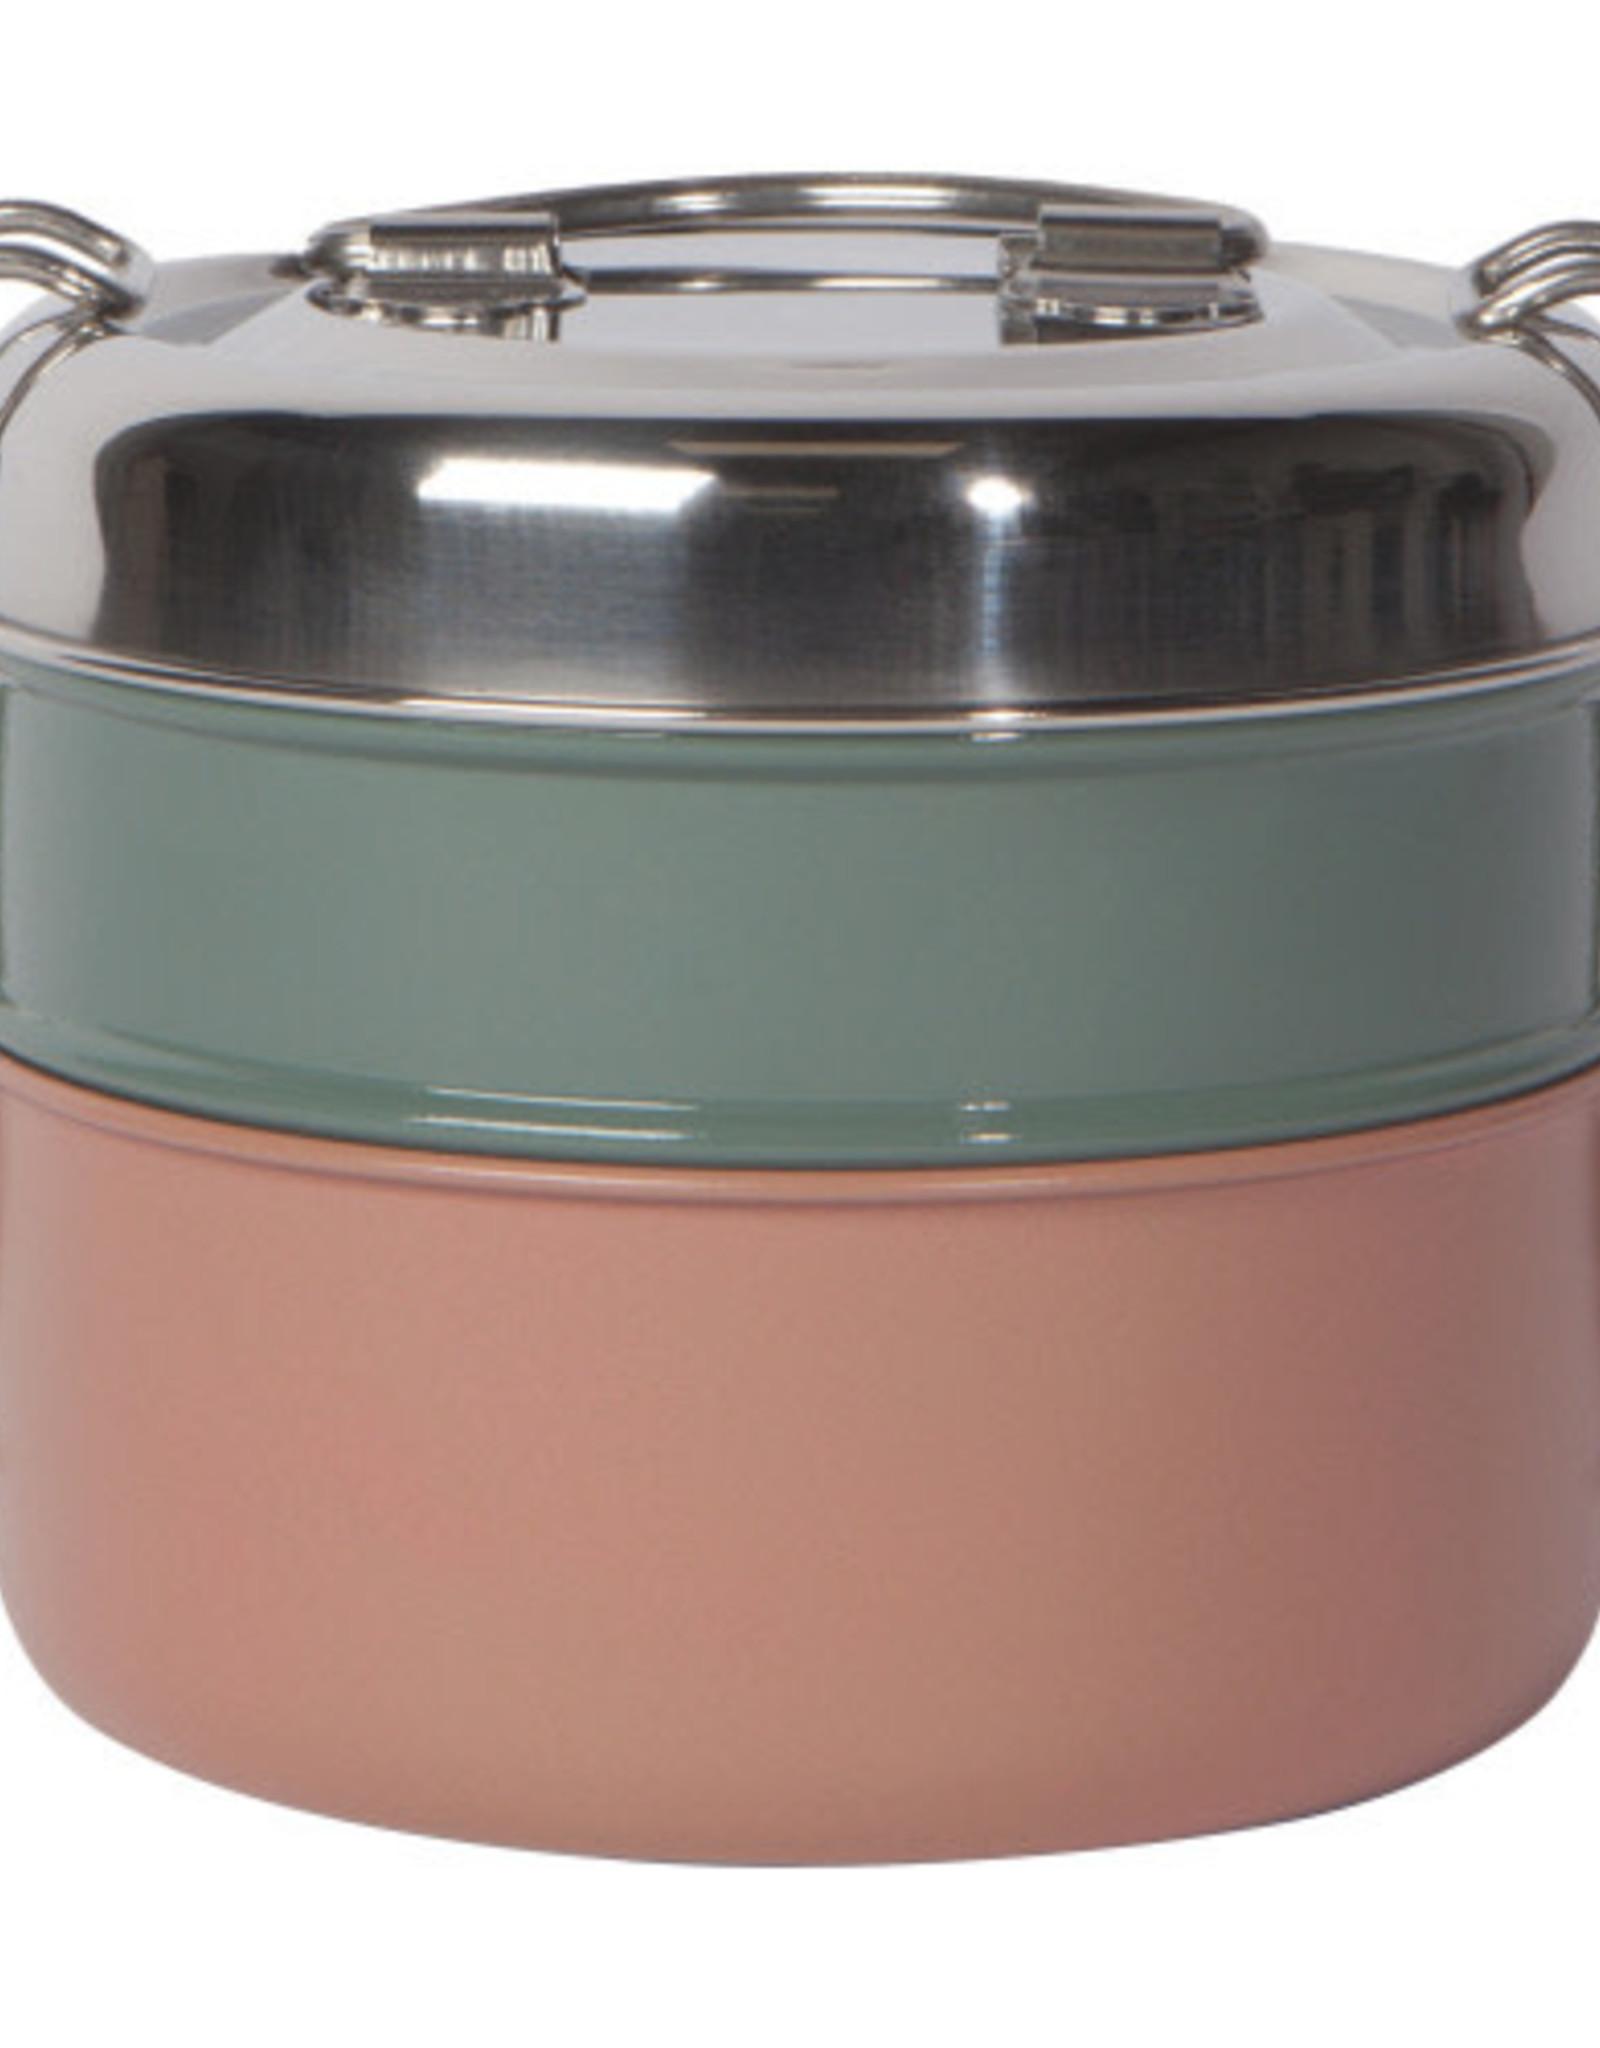 Danica danica   tiffin food container